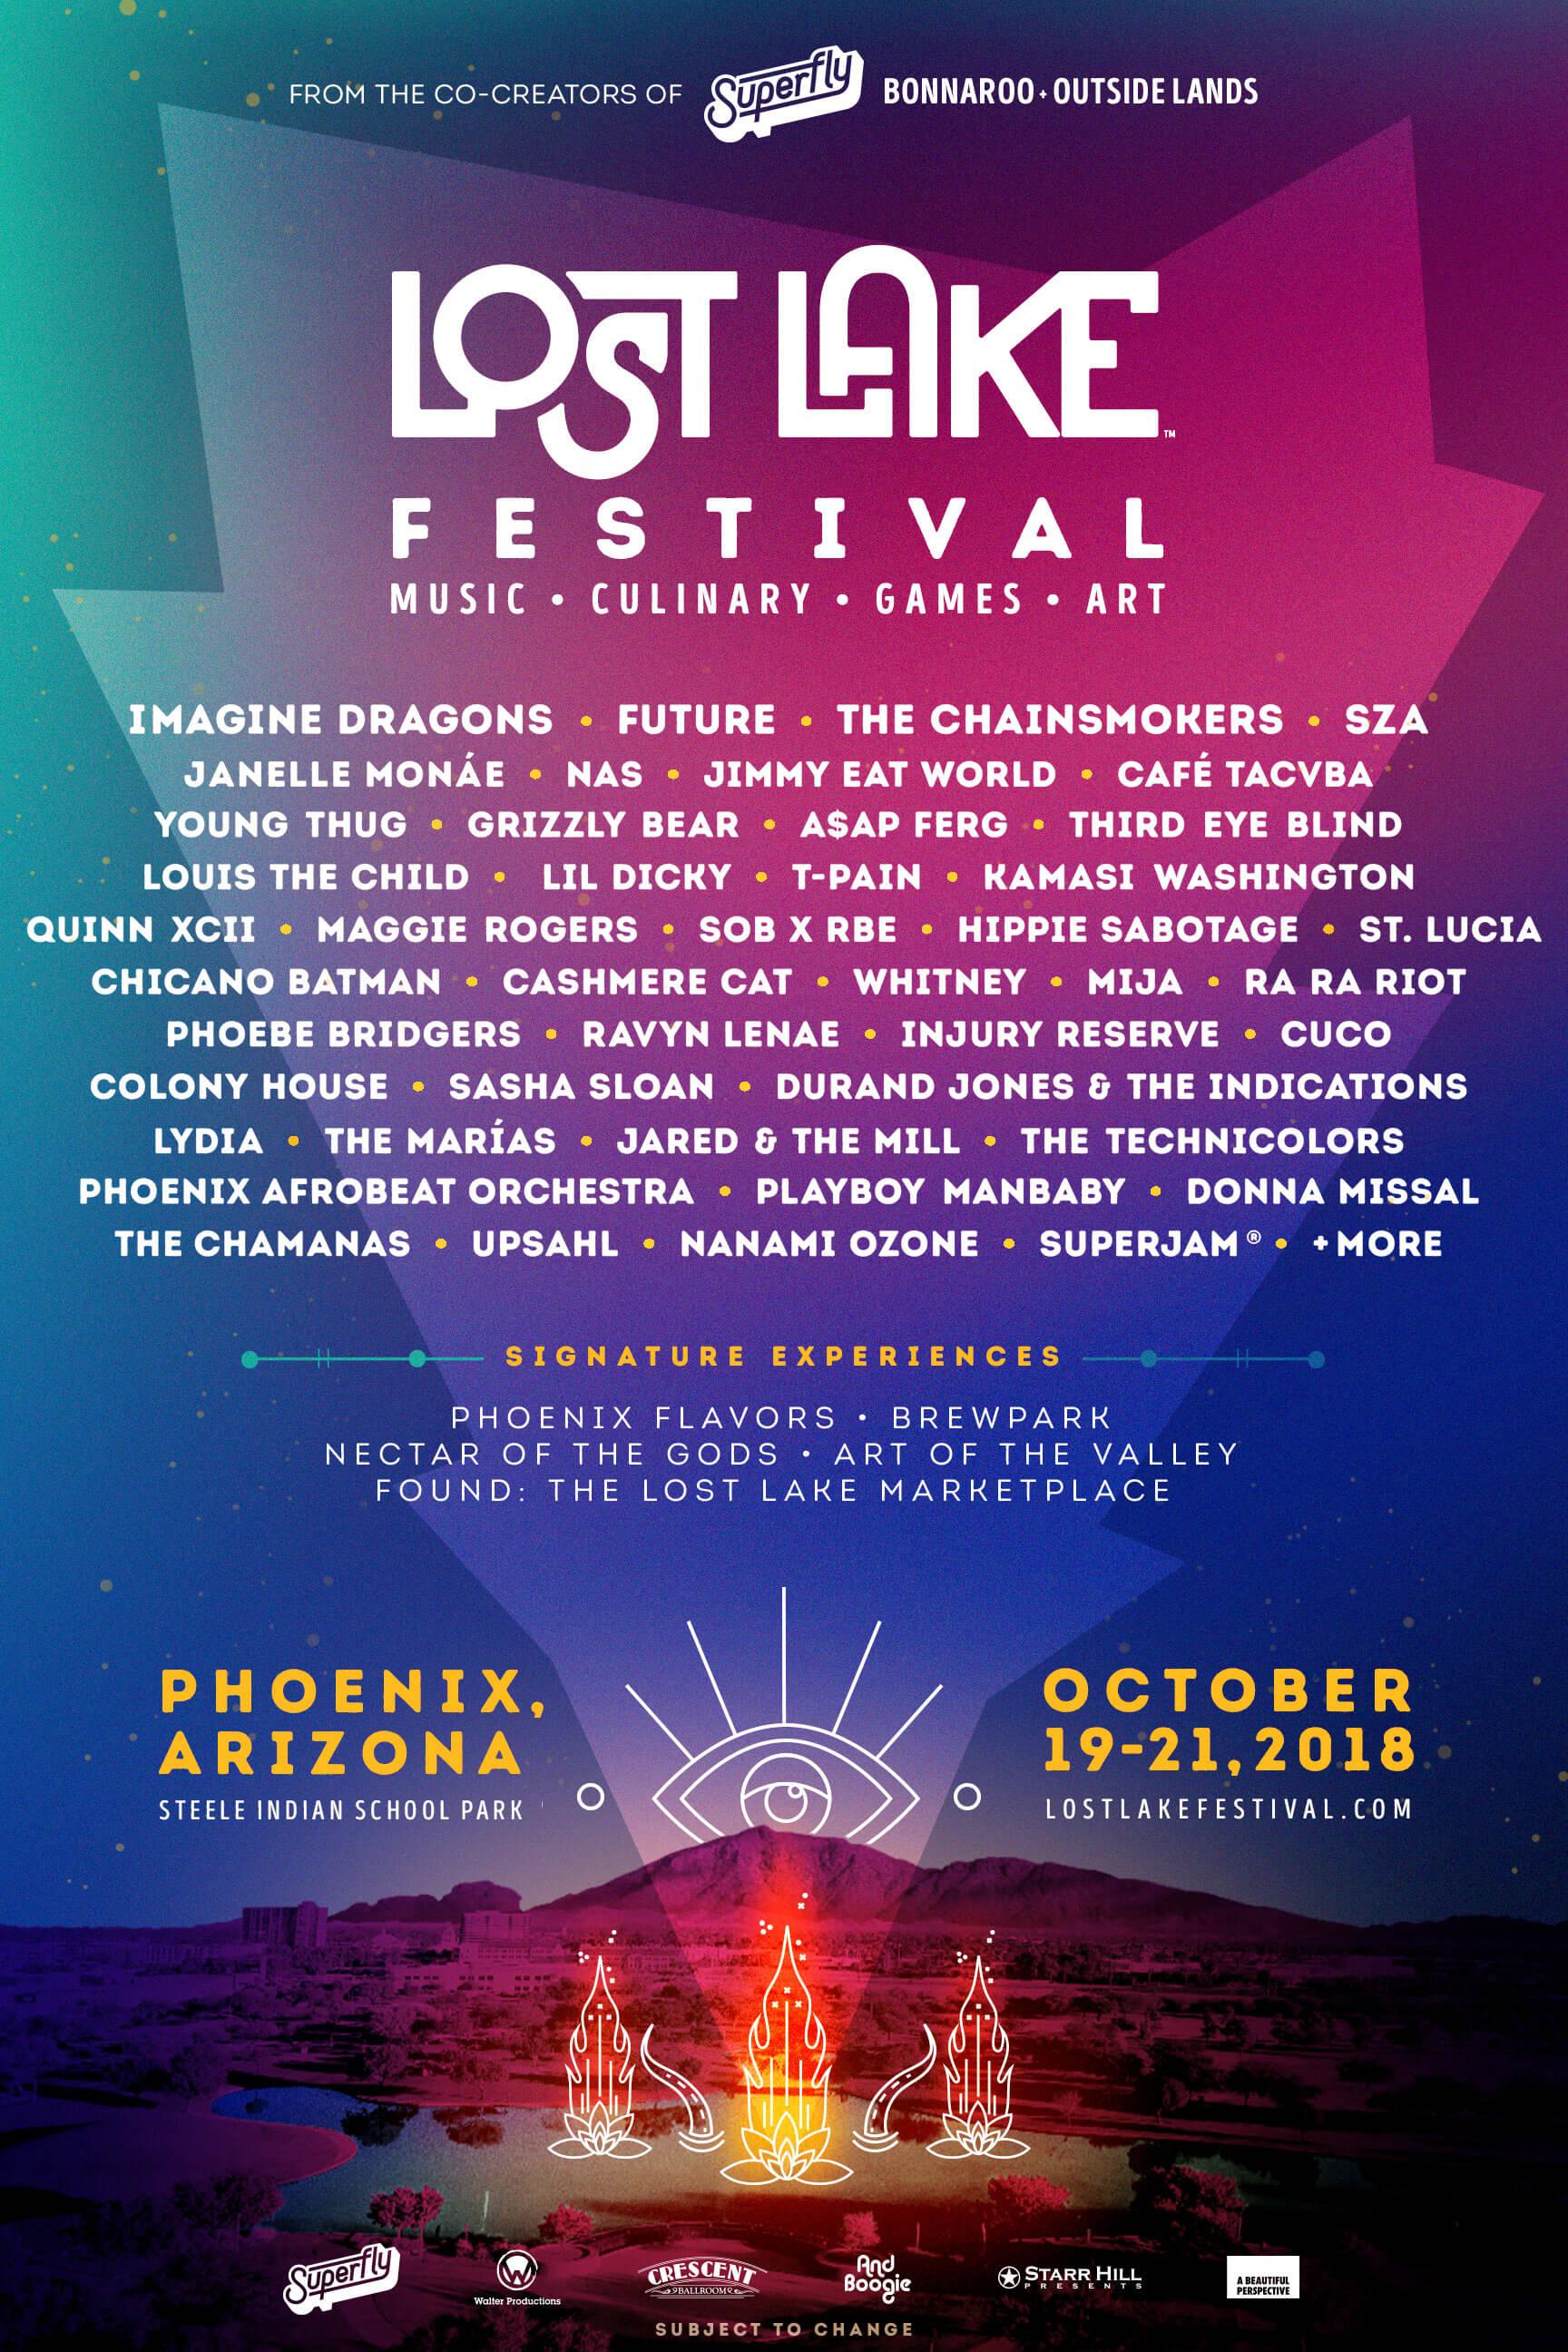 Lost Lake Festival lineup